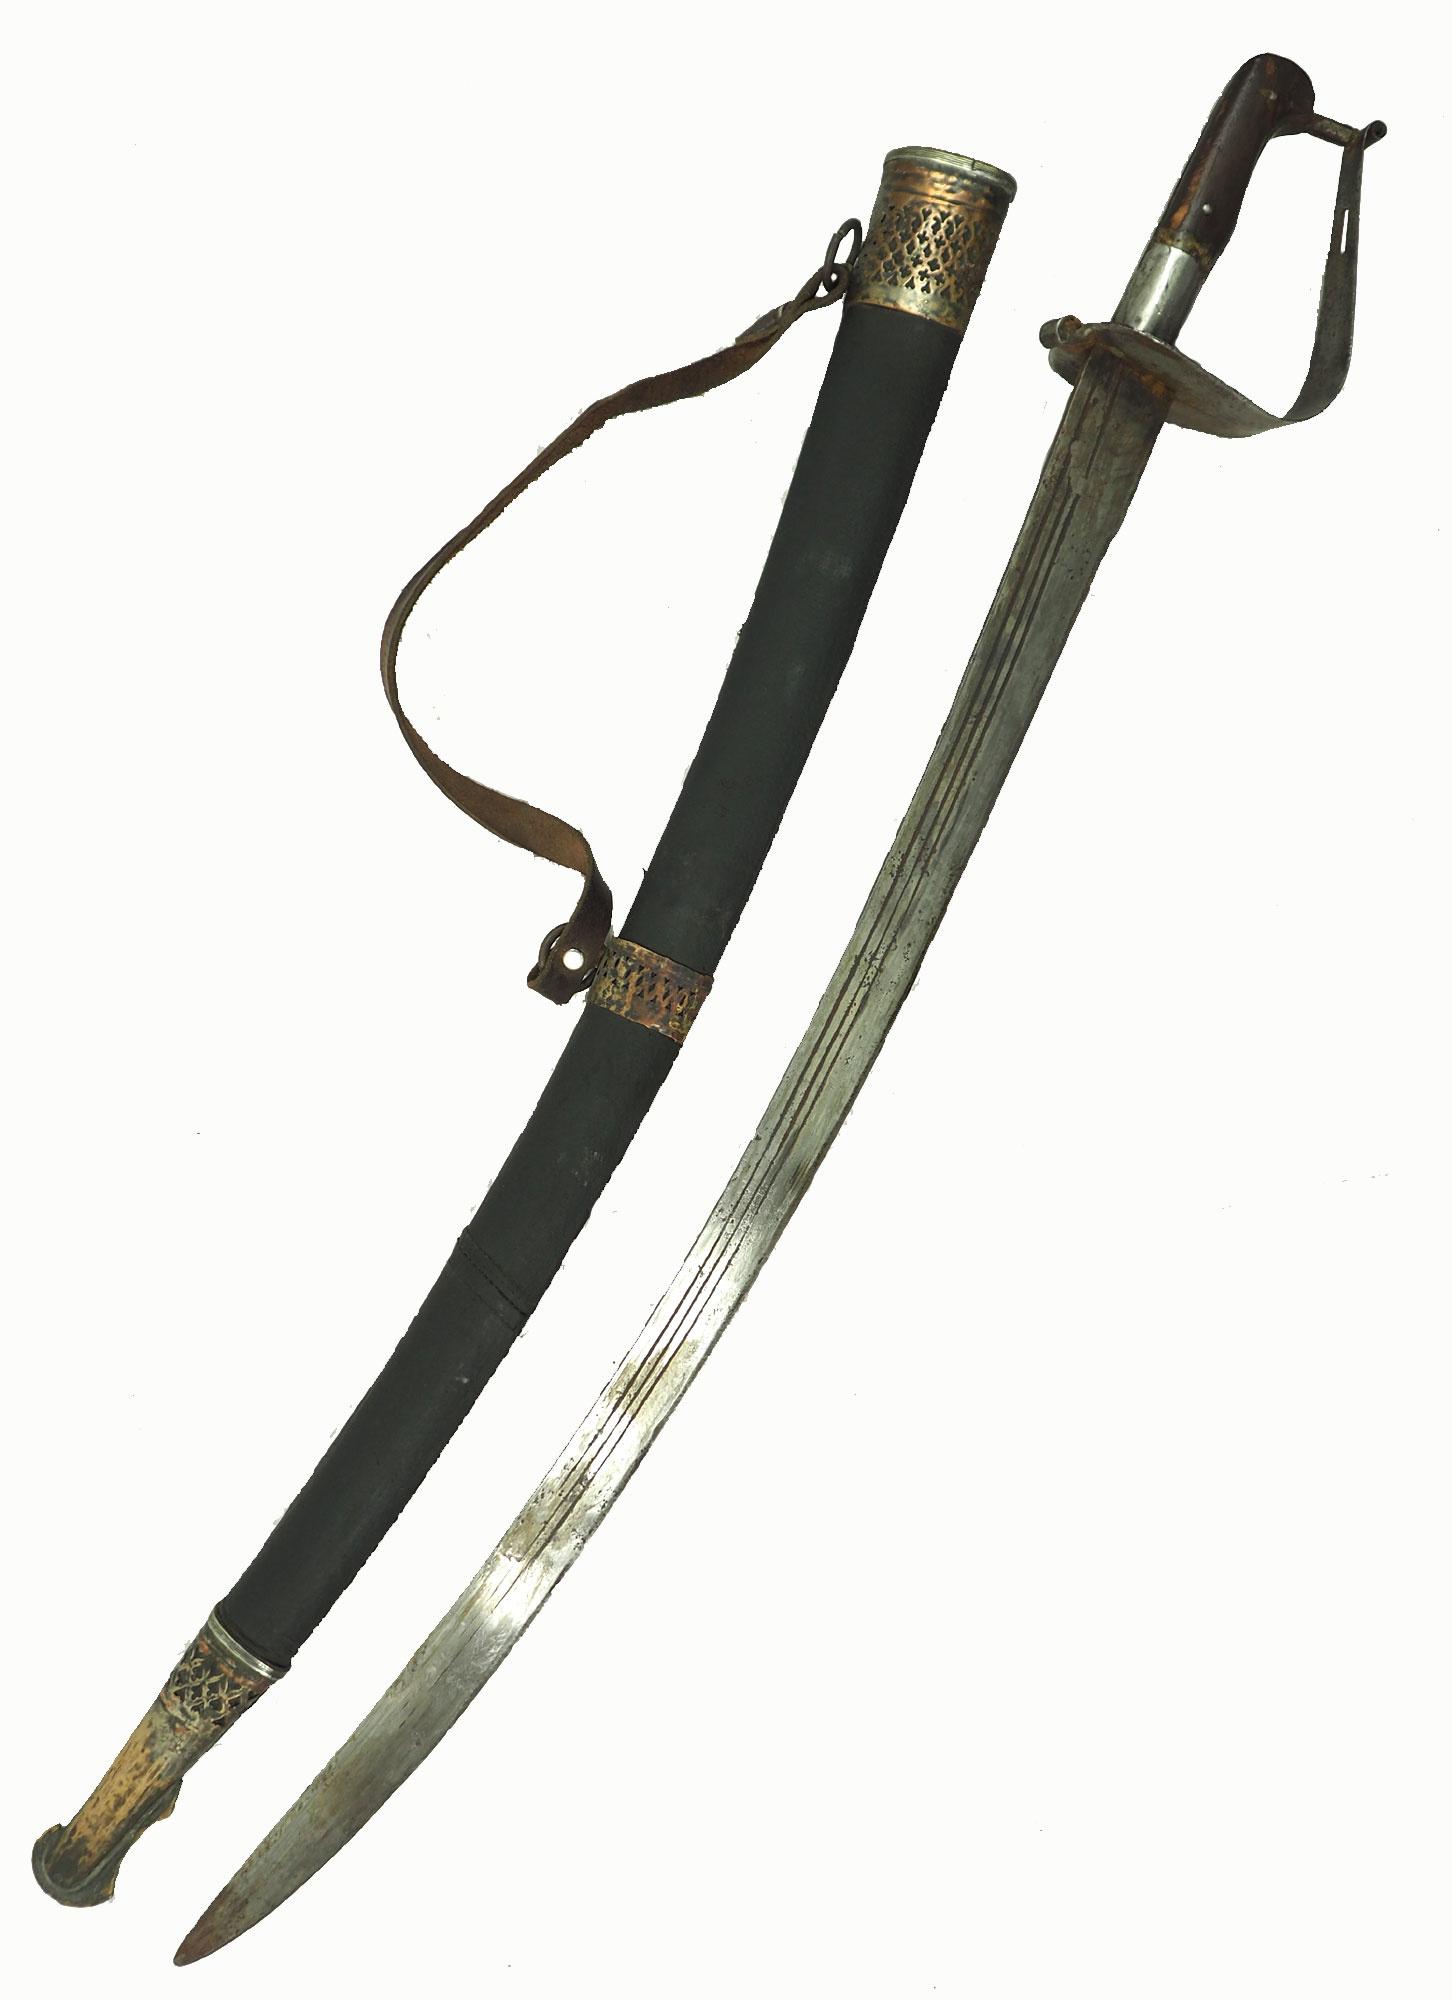 Antike Säbel messer schwert shamshir sword Knife aus Afghanistan Nr:19/J